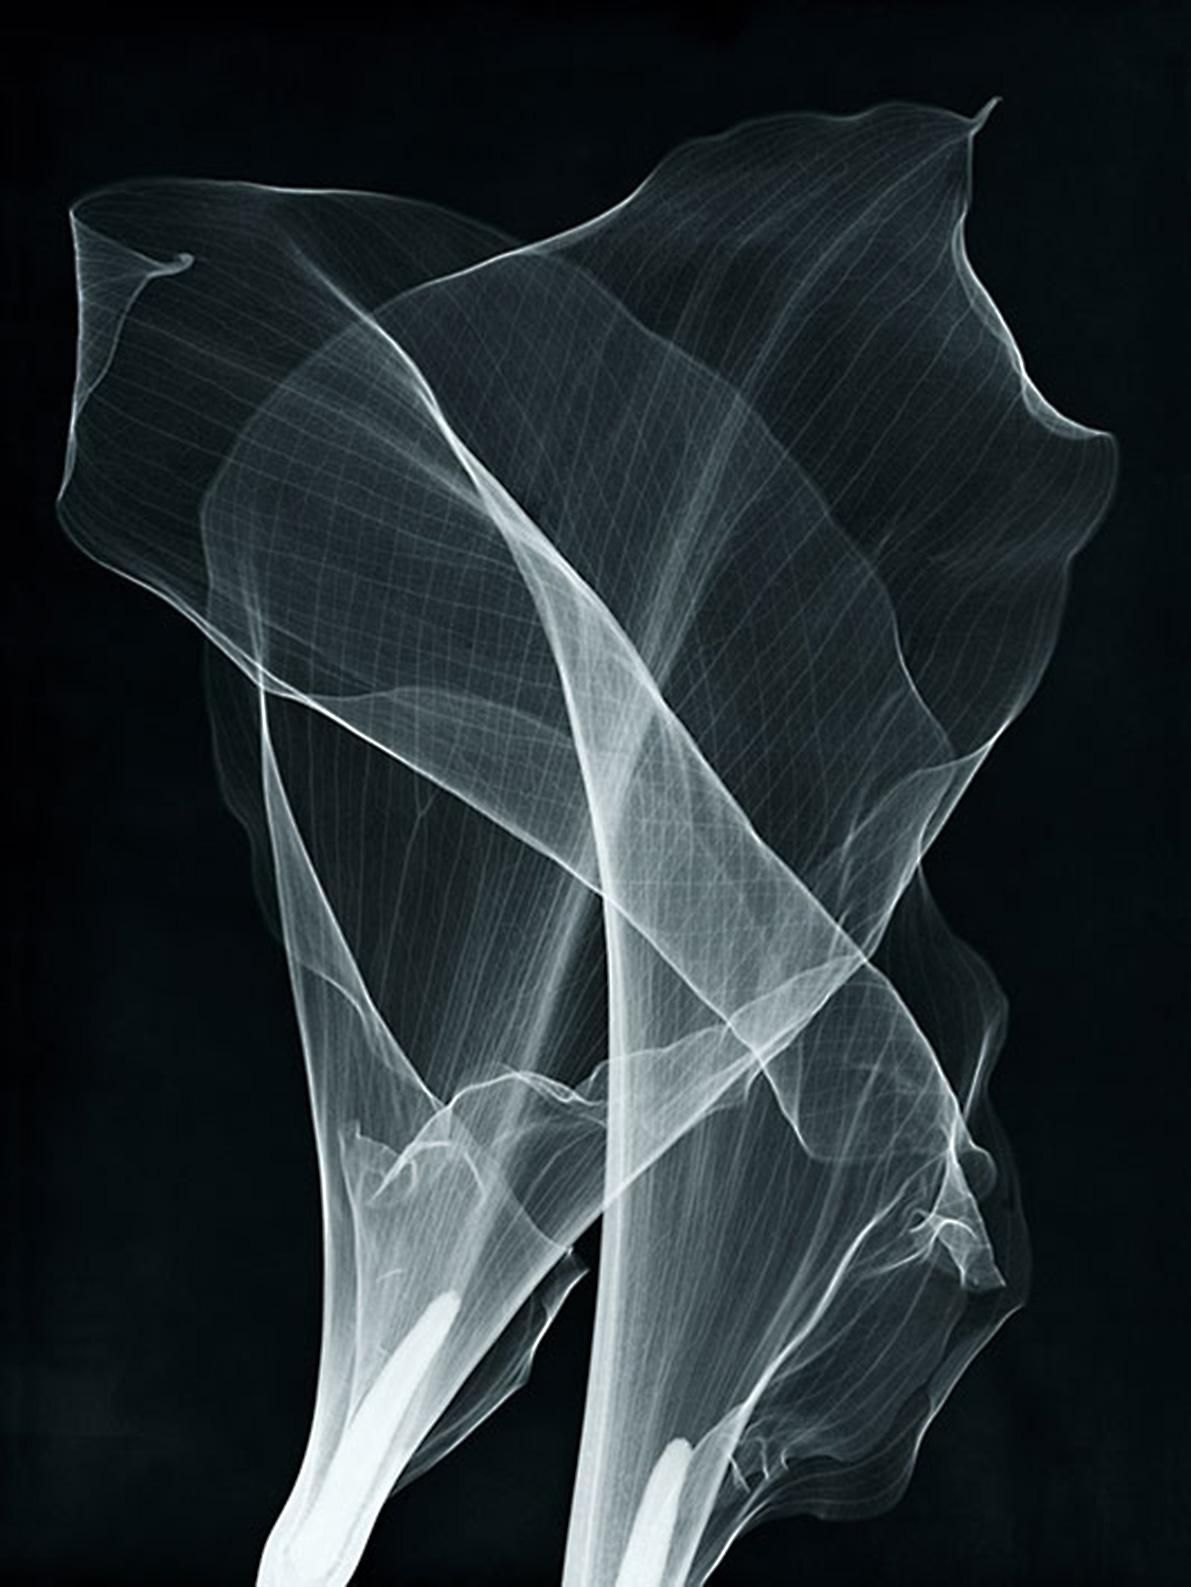 x-rays of callas